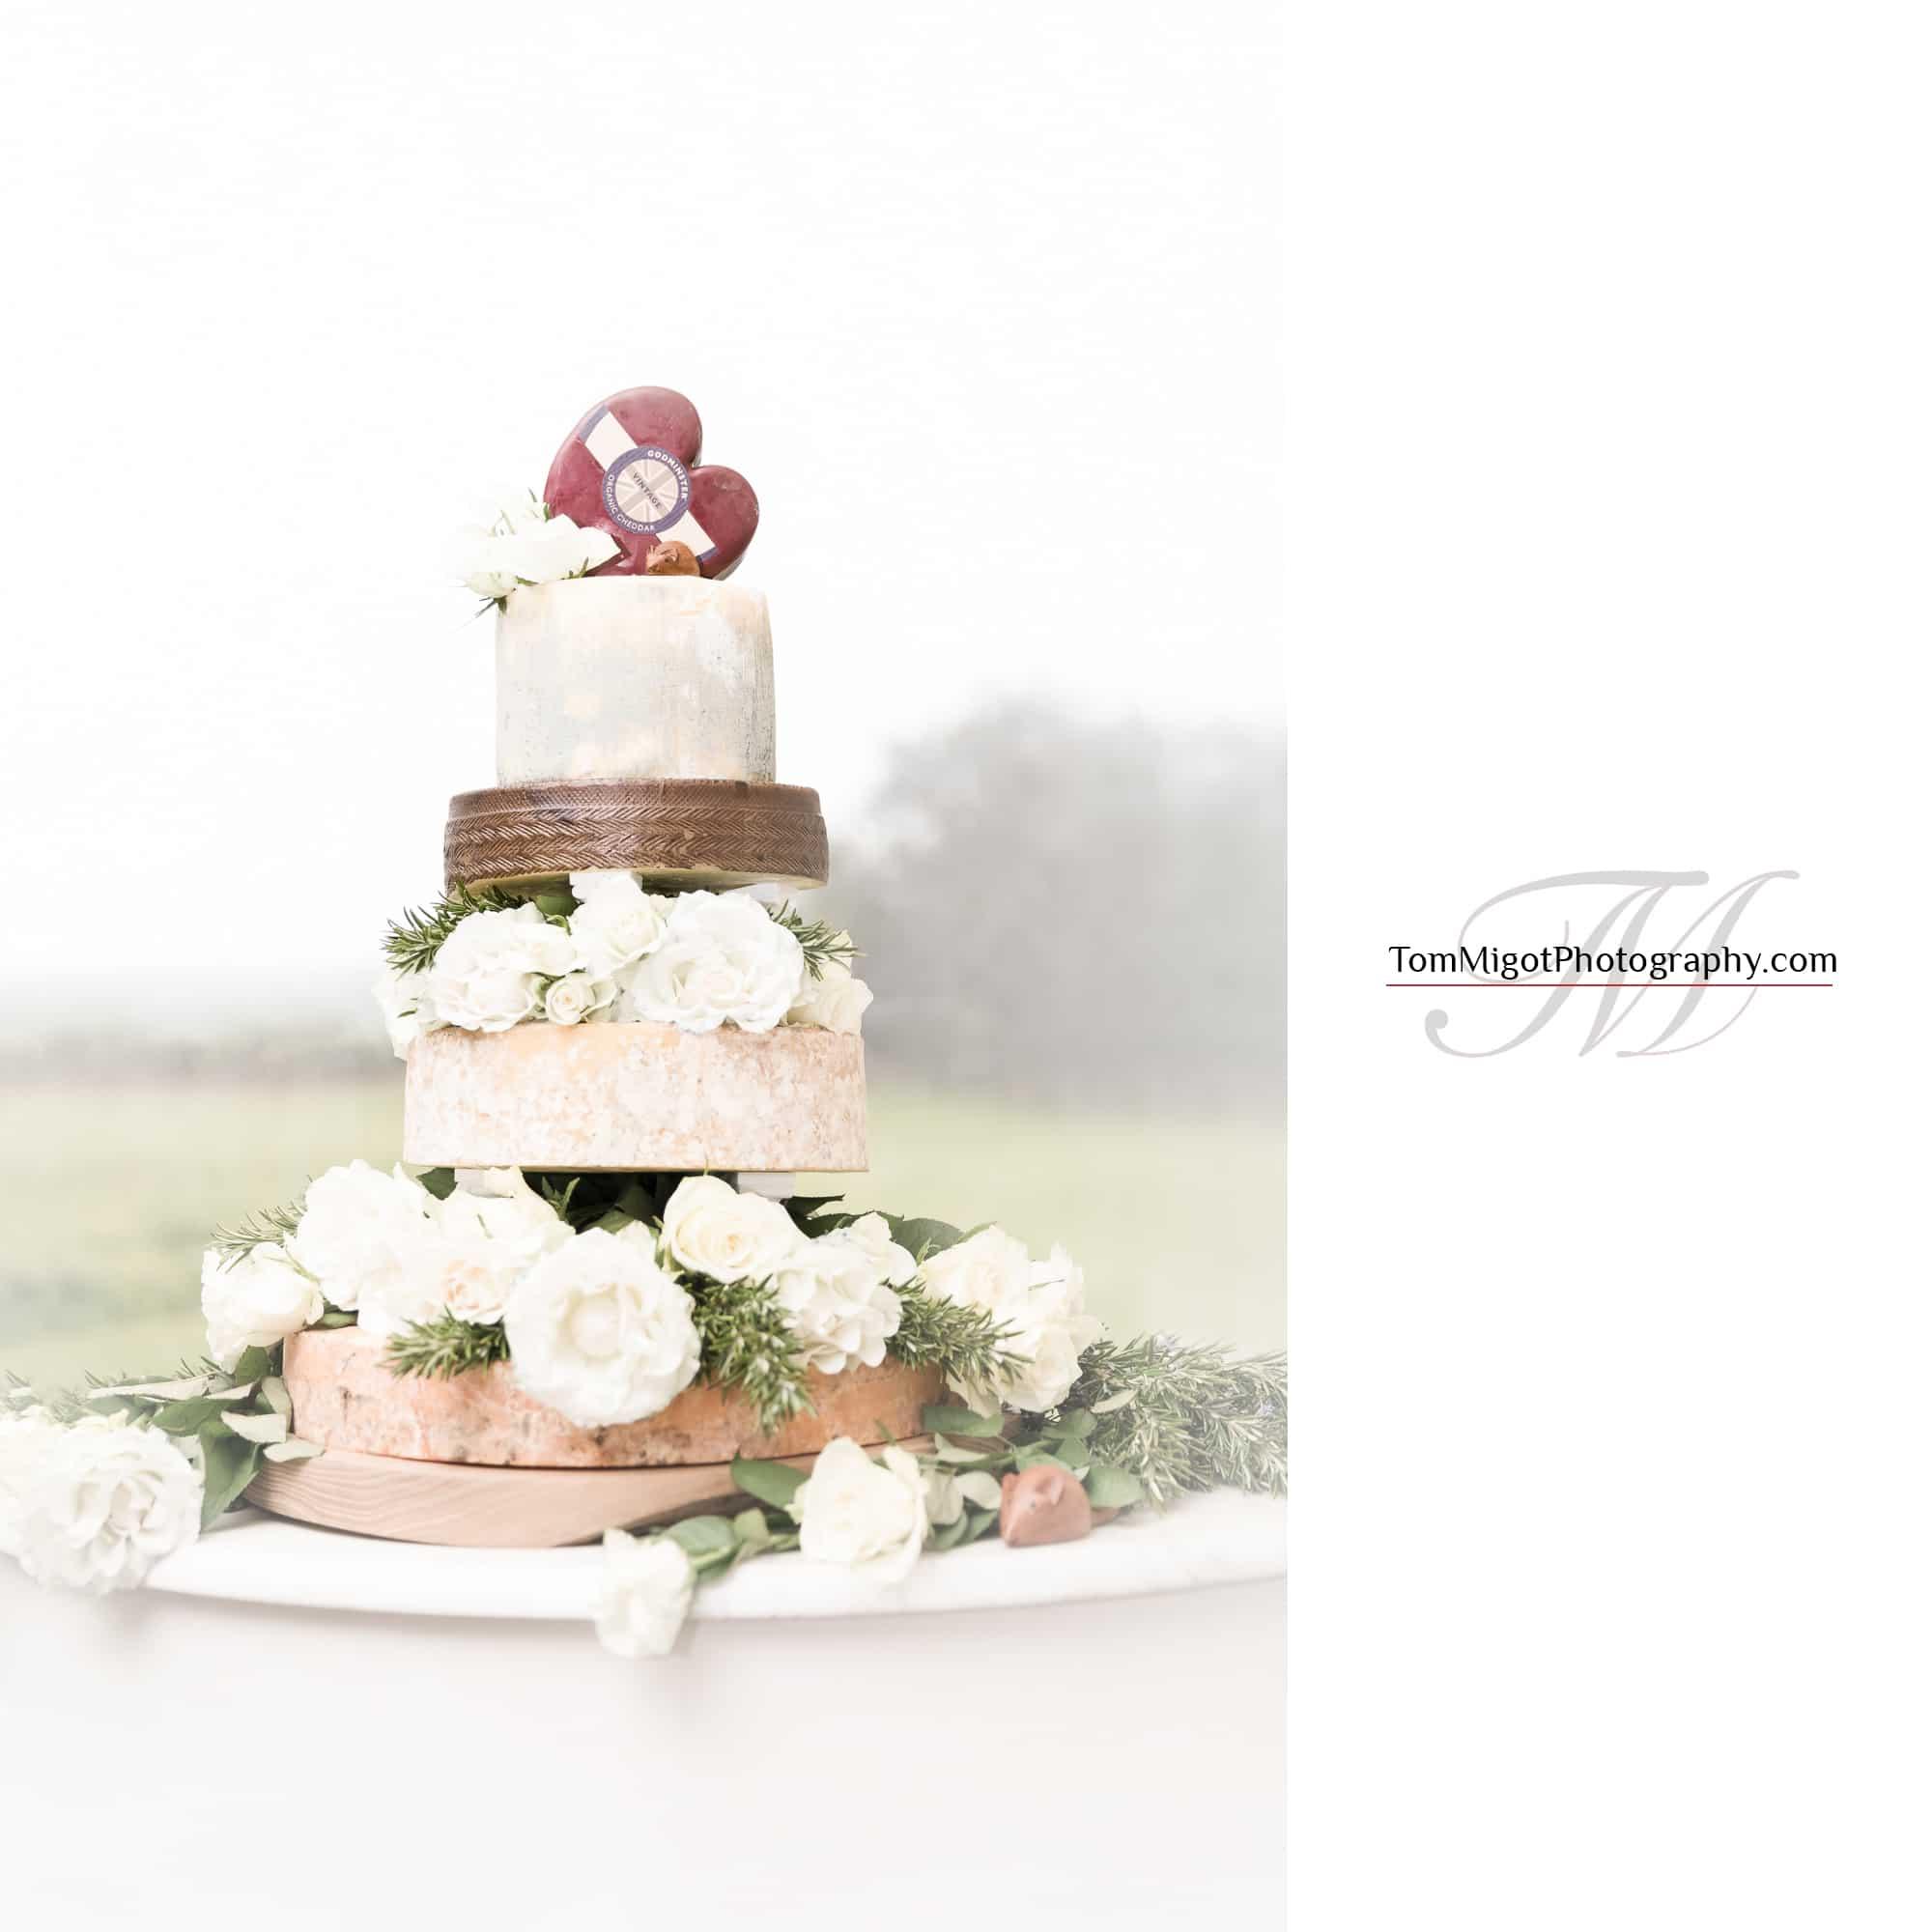 Le gâteau de mariage original au fromage